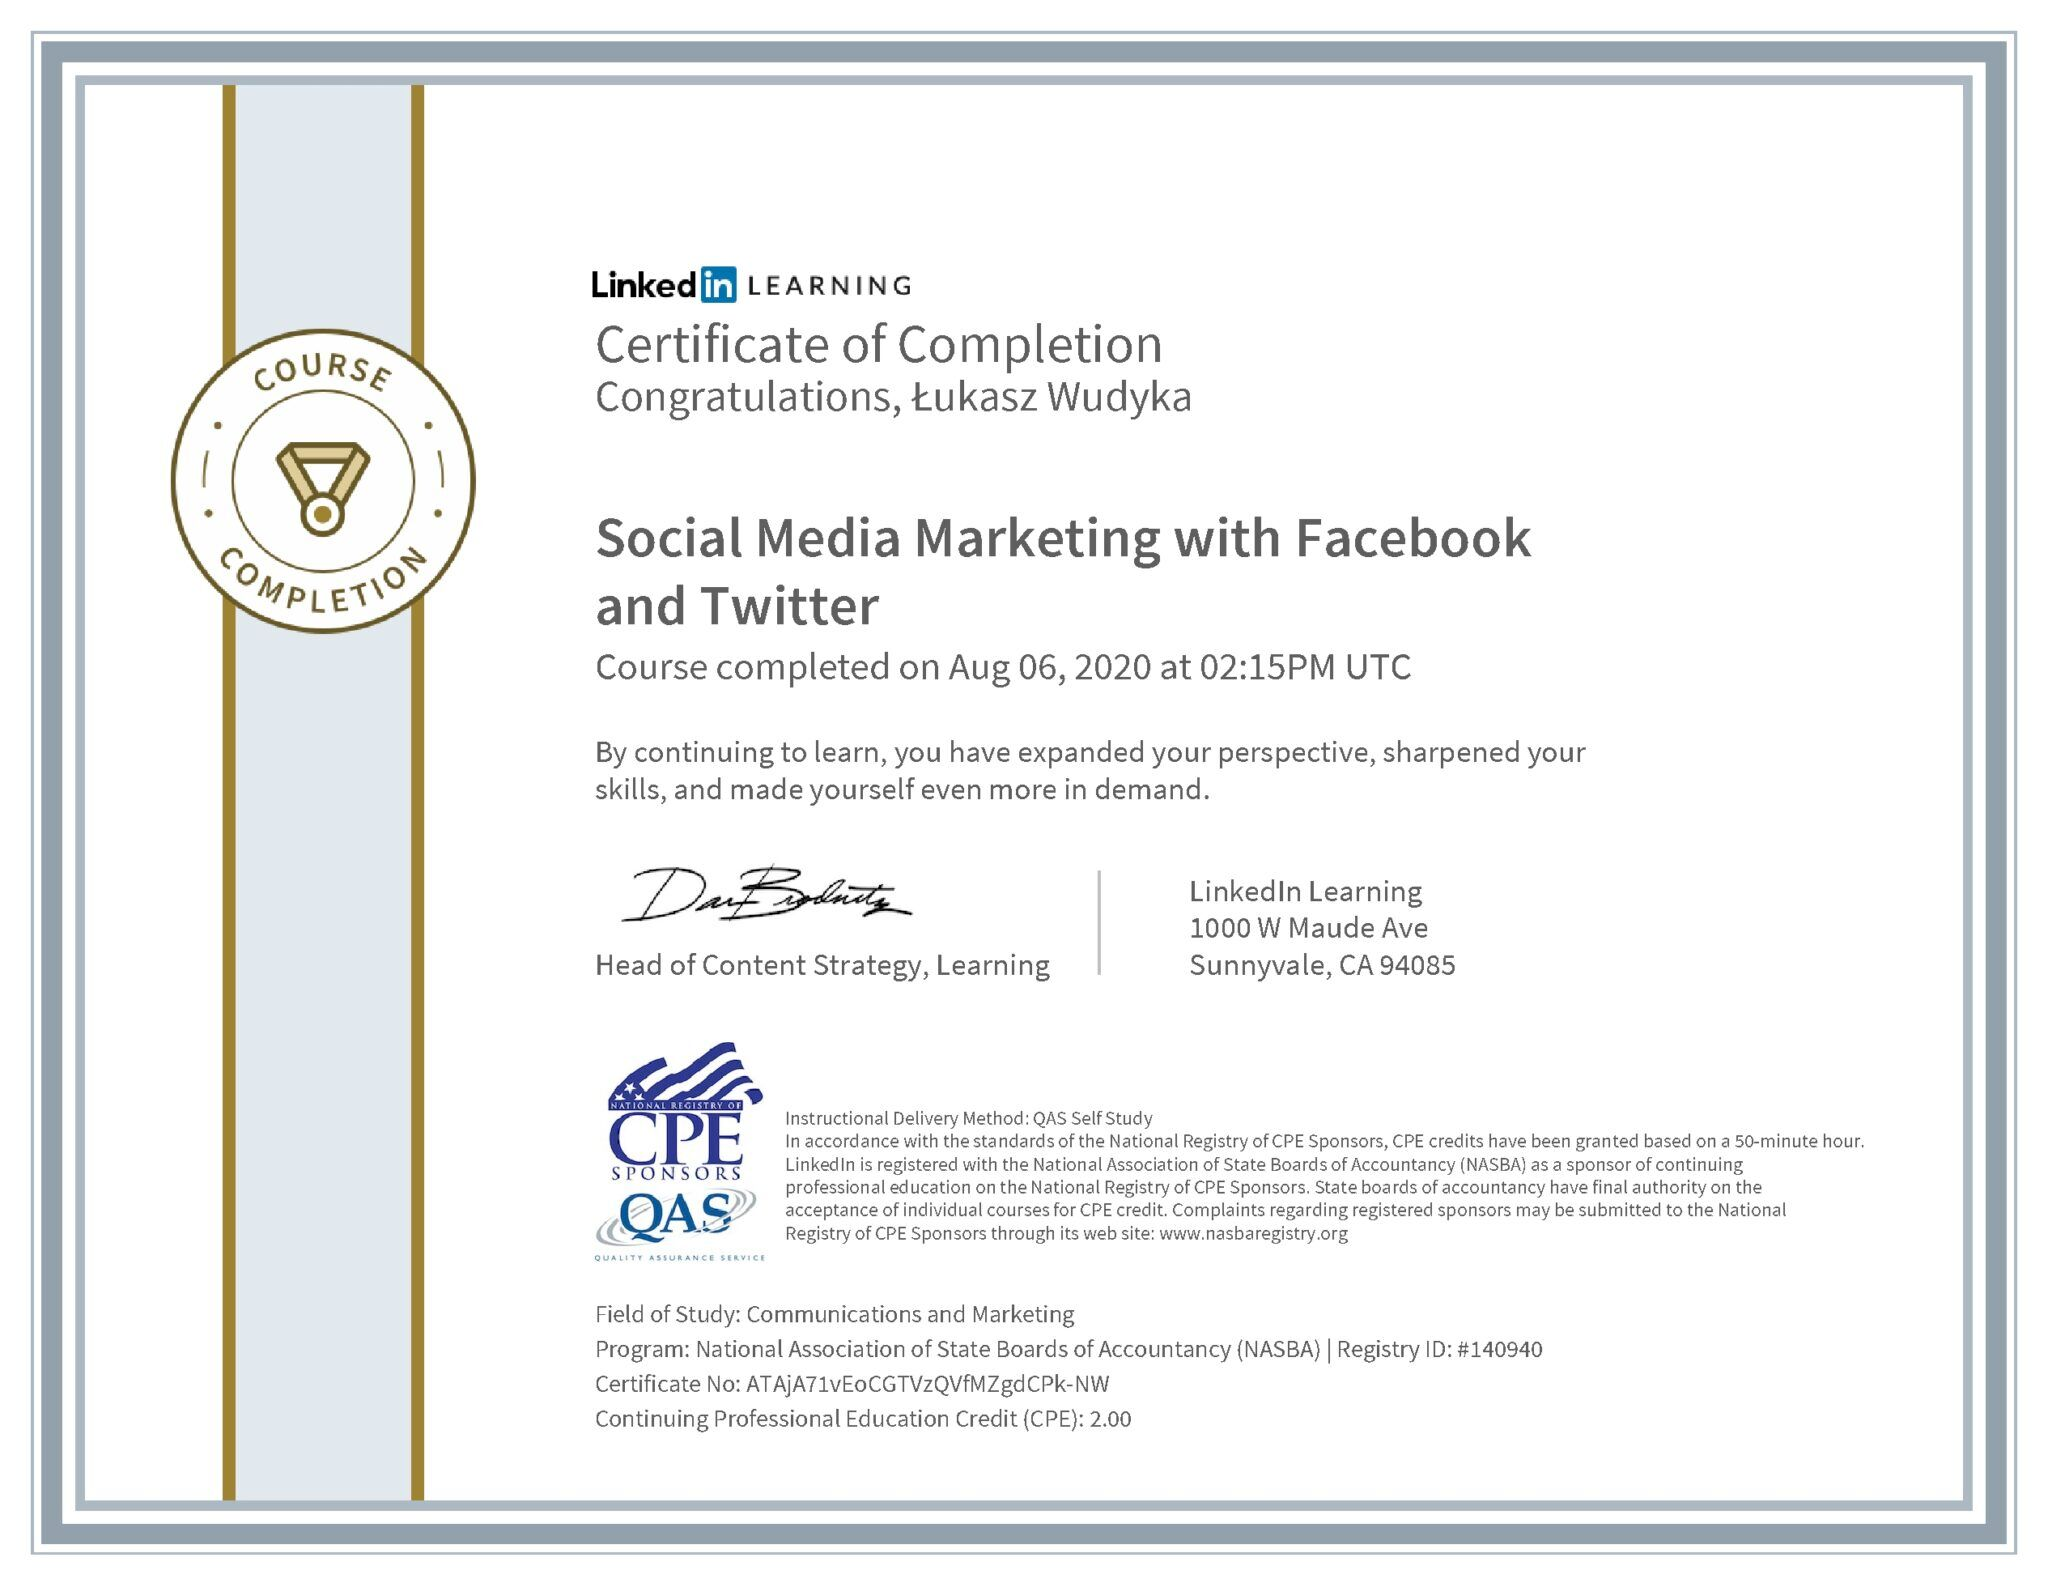 Łukasz Wudyka certyfikat LinkedIn Social Media Marketing with Facebook and Twitter NASBA